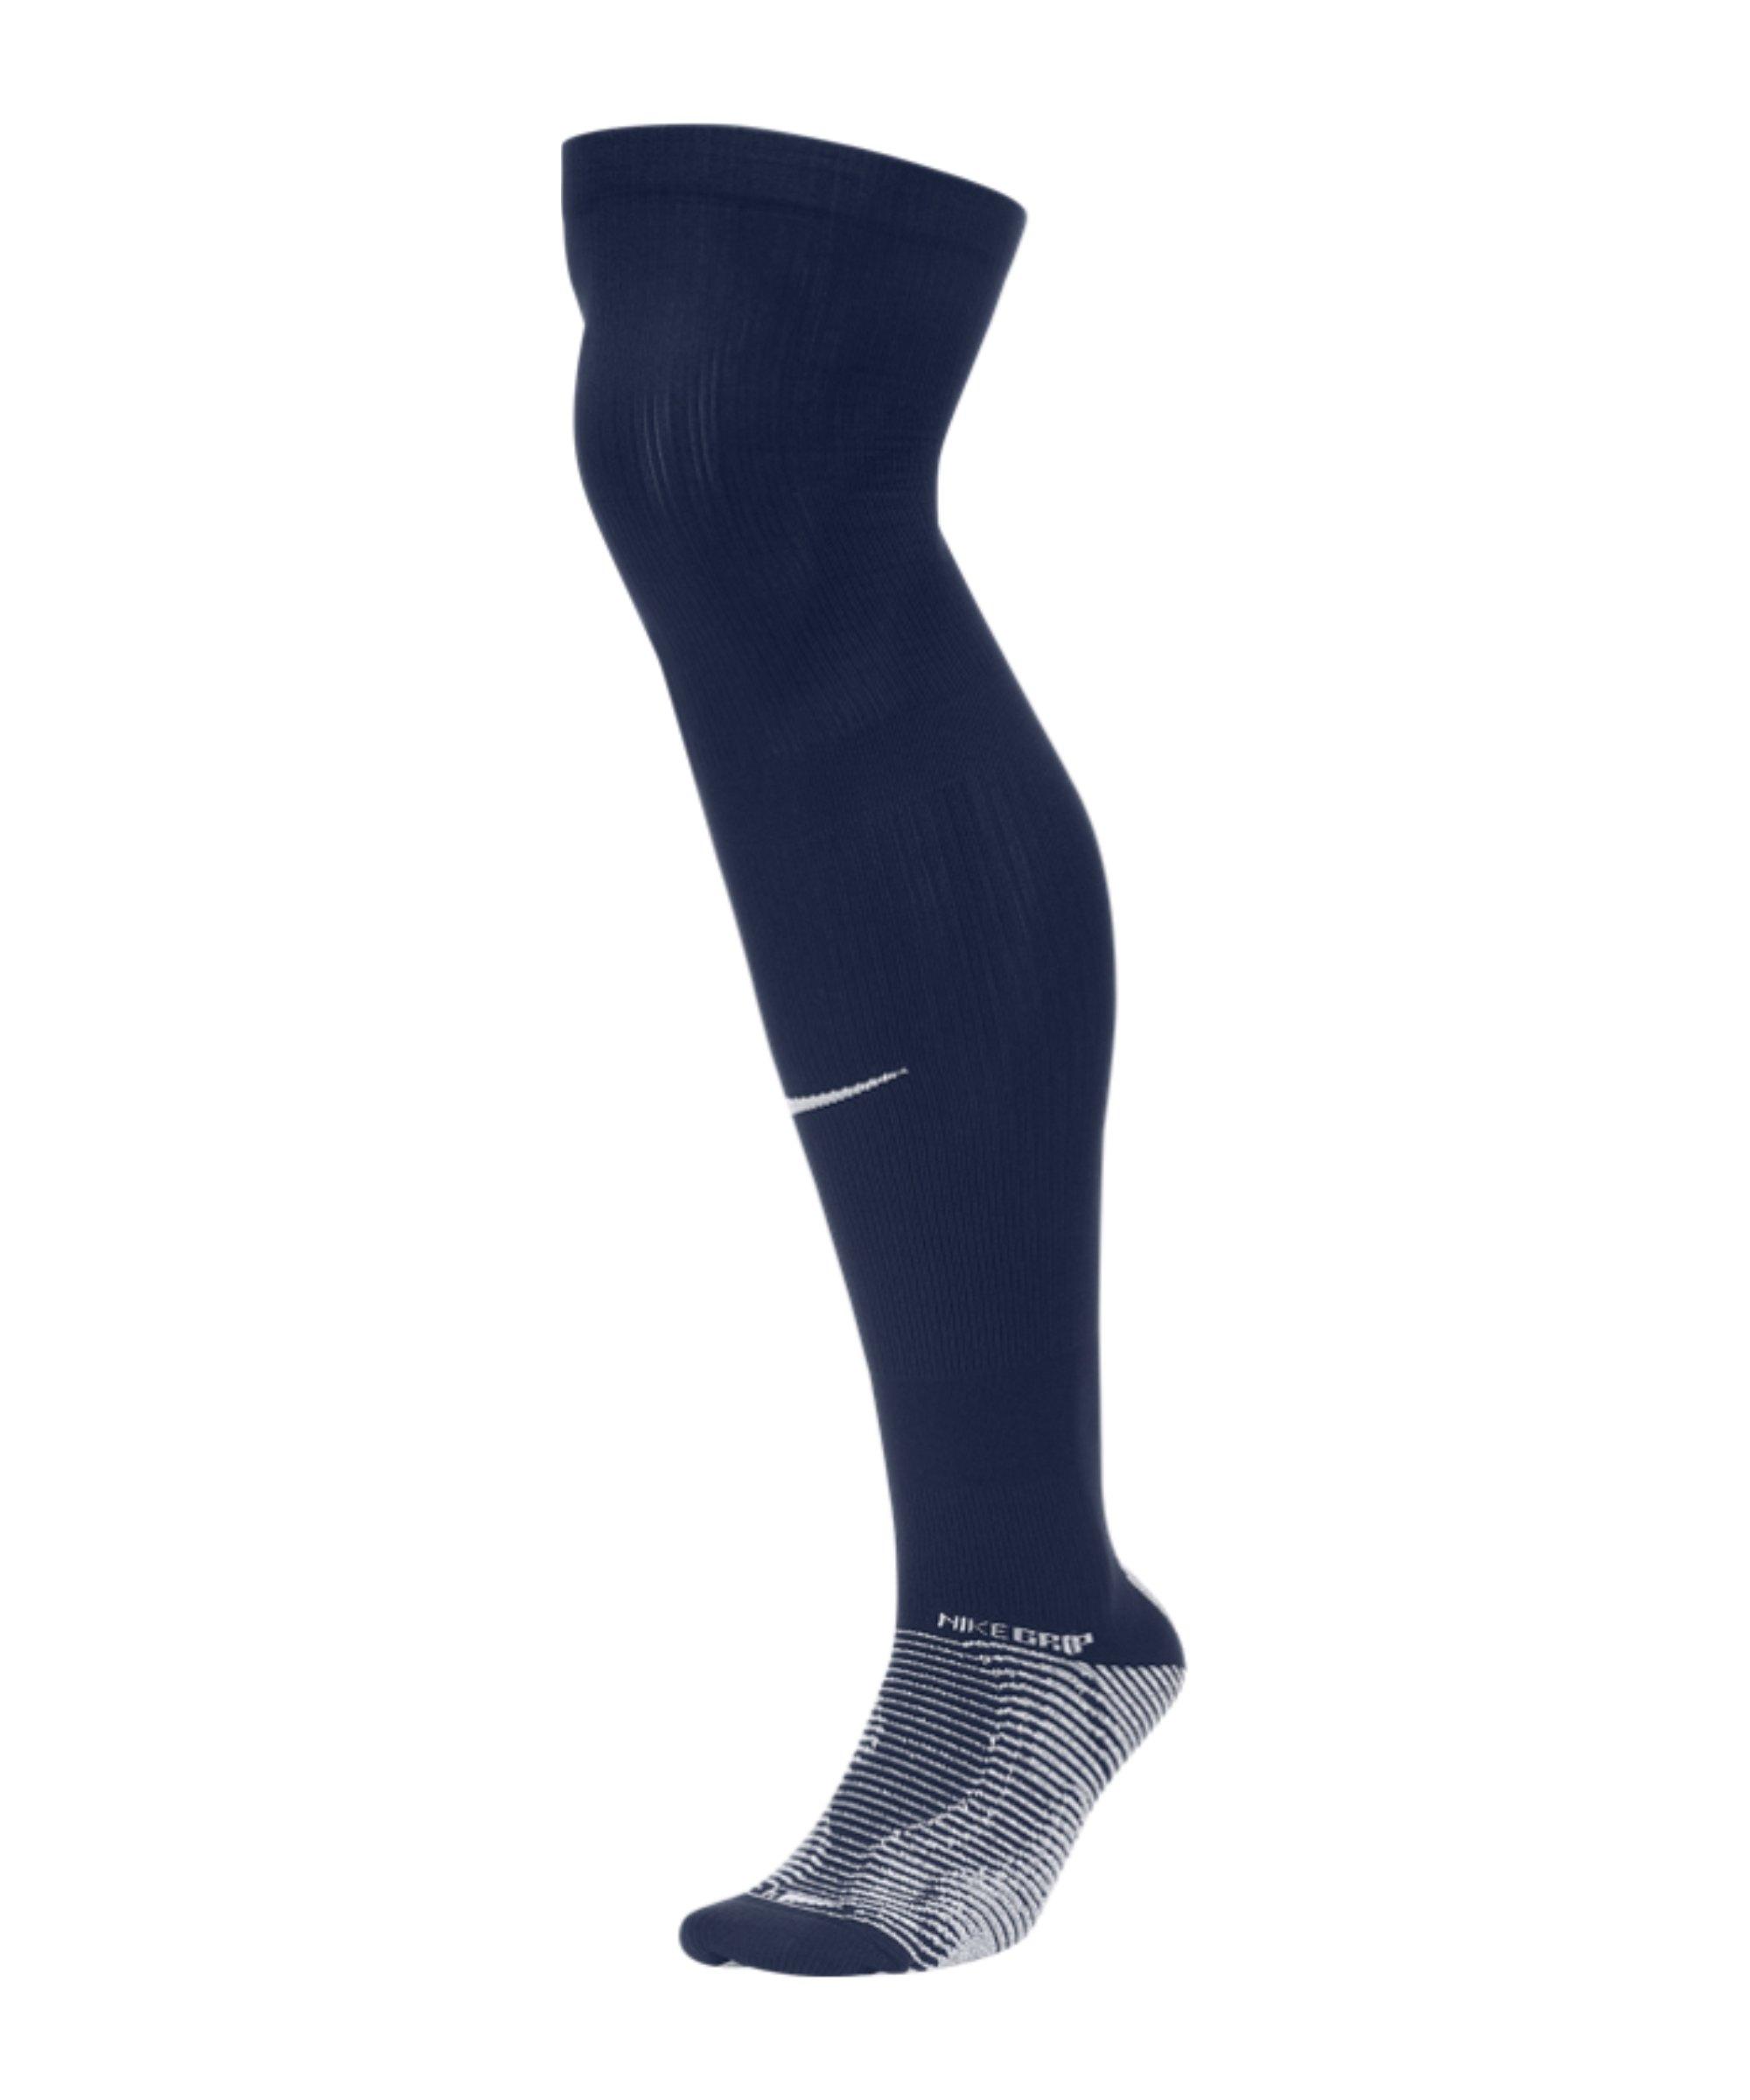 Nike Grip Strike Stutzenstrumpf Blau F410 - blau